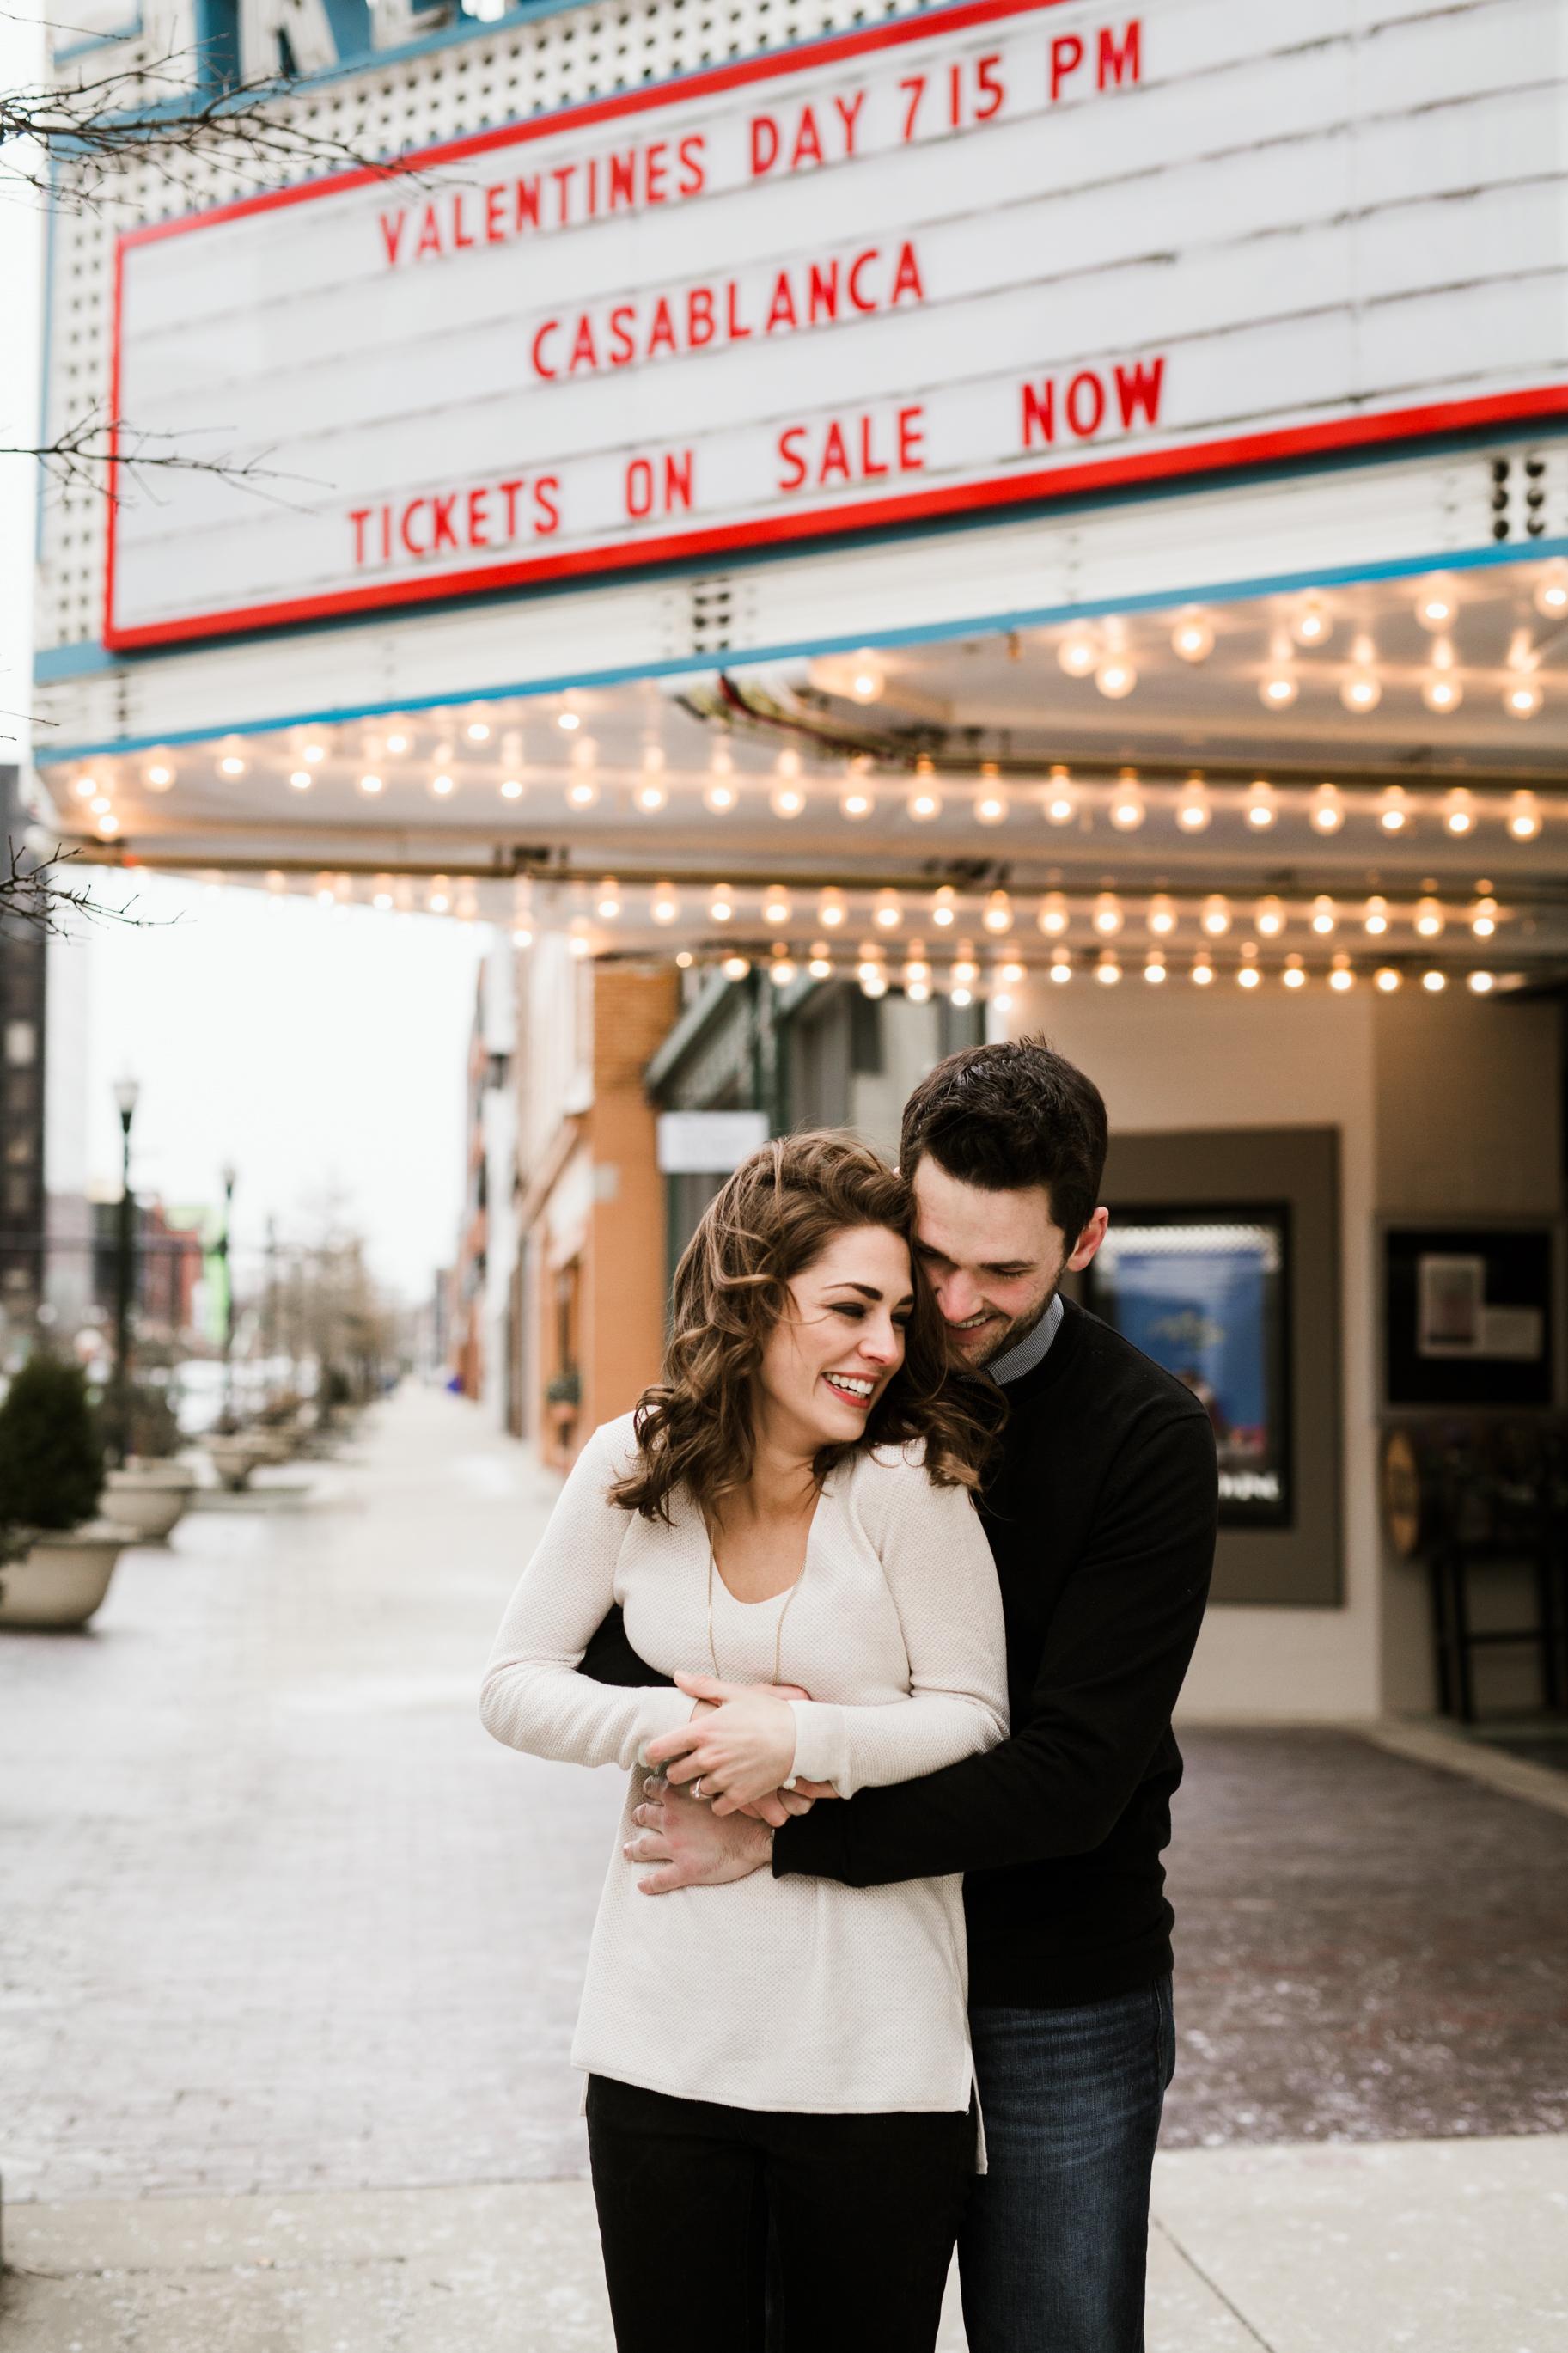 Ellen & Lee Engagement 2018 WEBSITE SP Crystal Ludwick Photo (4 of 54).jpg